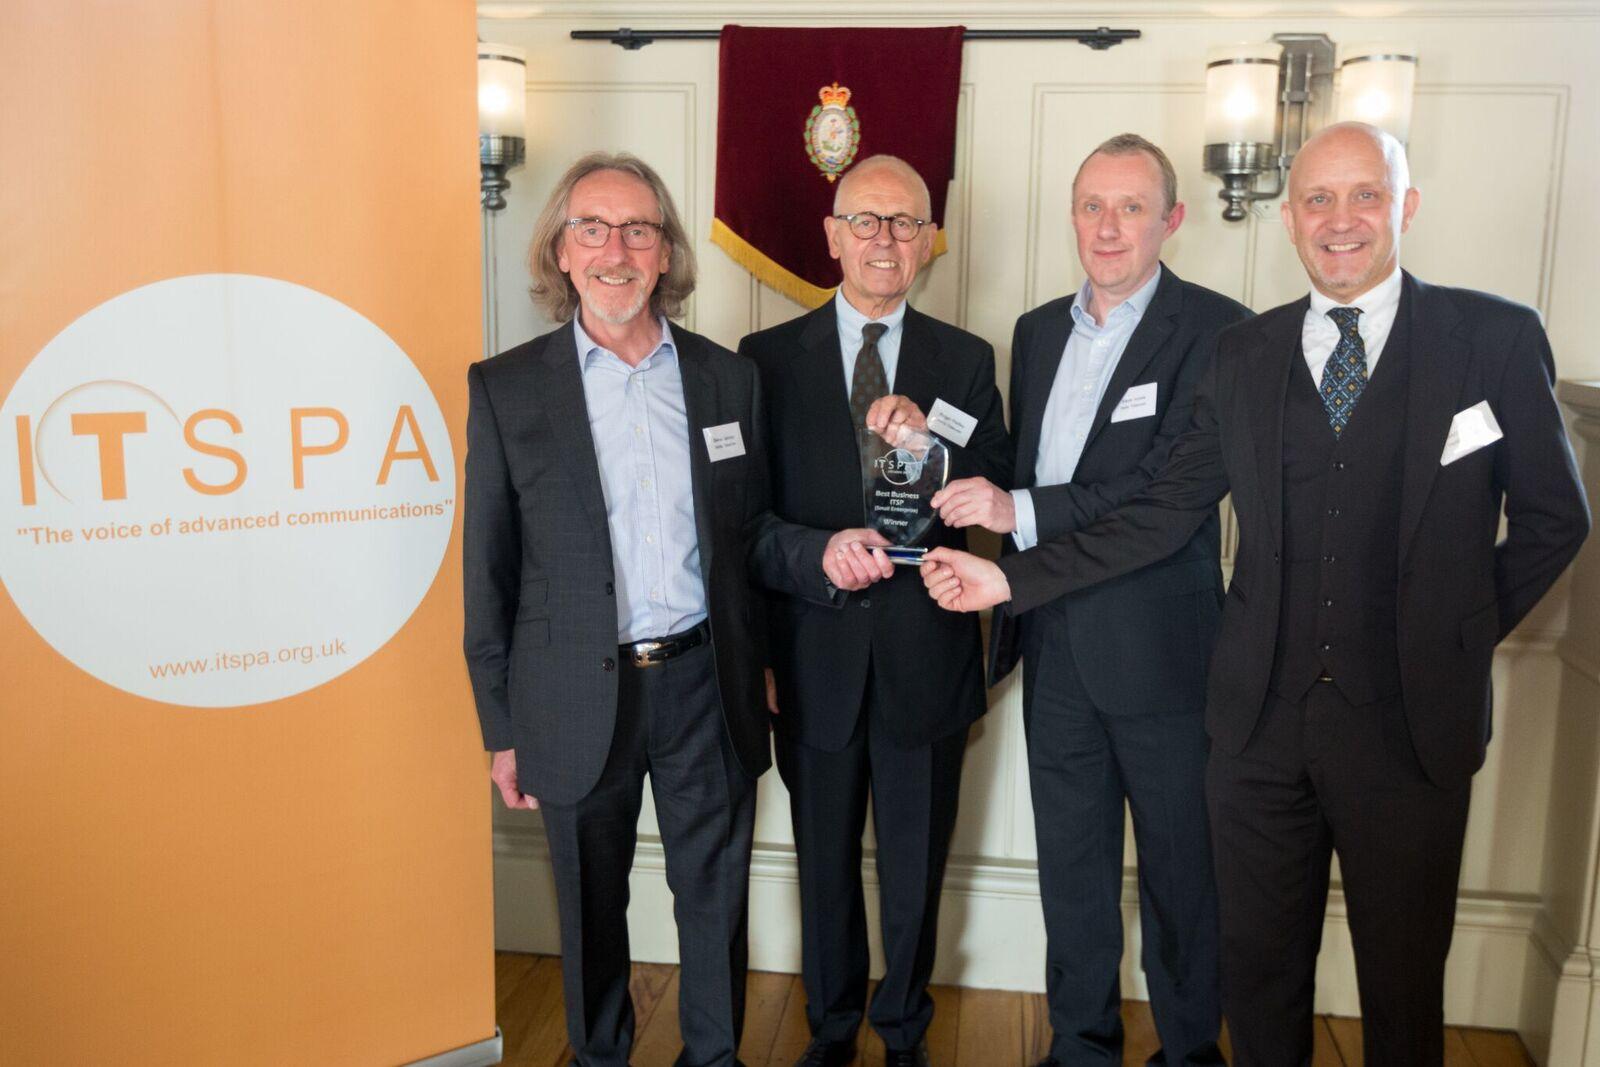 ITSPA award winner VoIP telephony